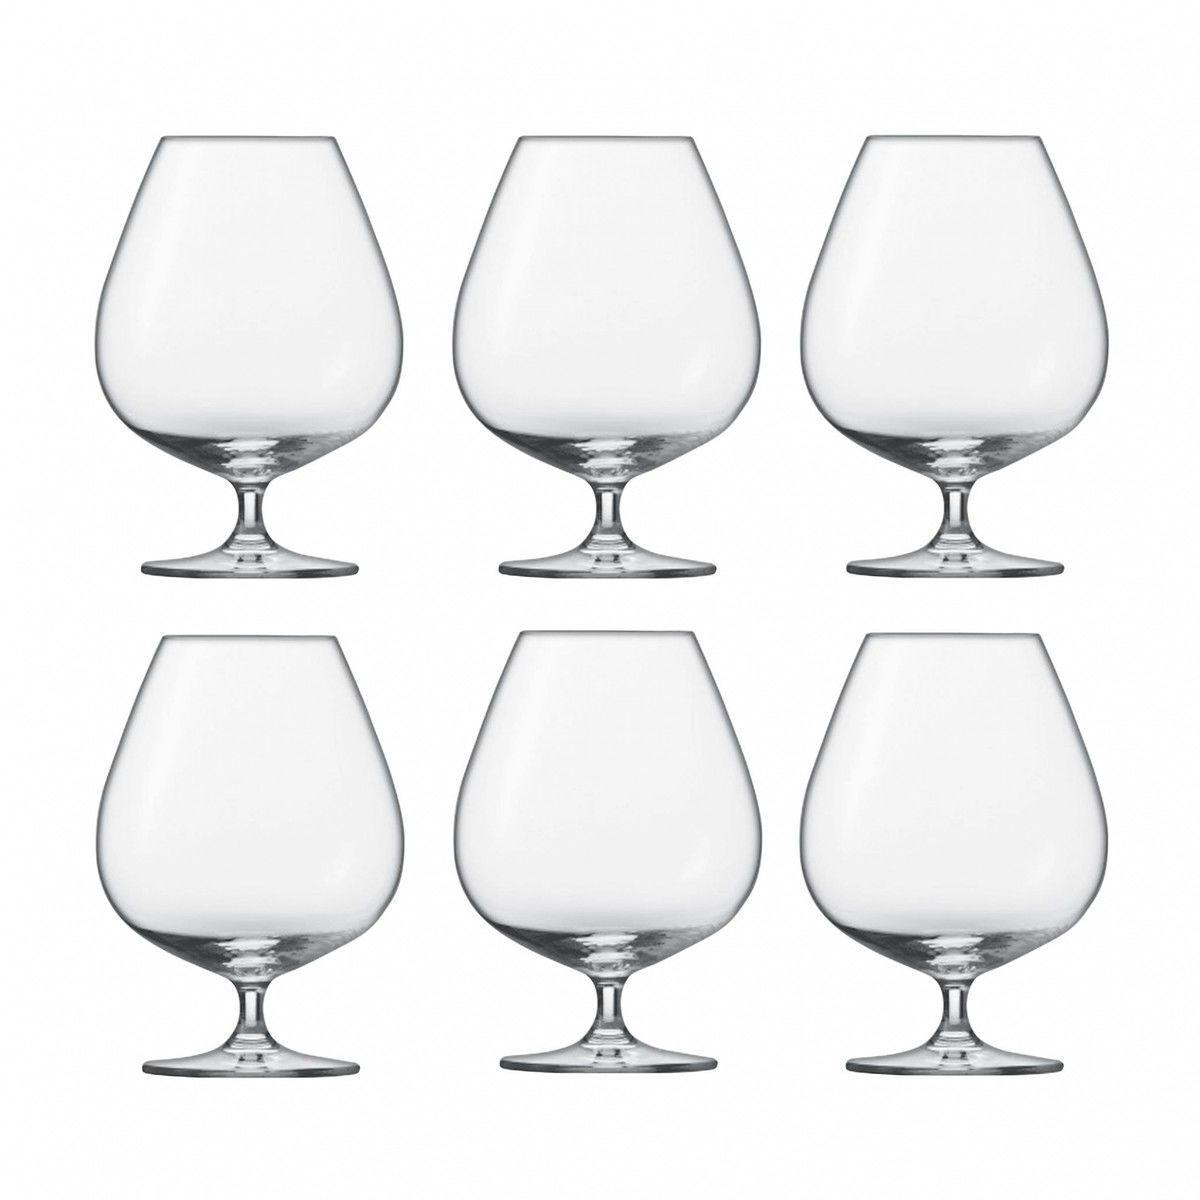 bar special brandy xxl glass set of   schott zwiesel  - schott zwiesel  bar special brandy xxl glass set of   transparentml